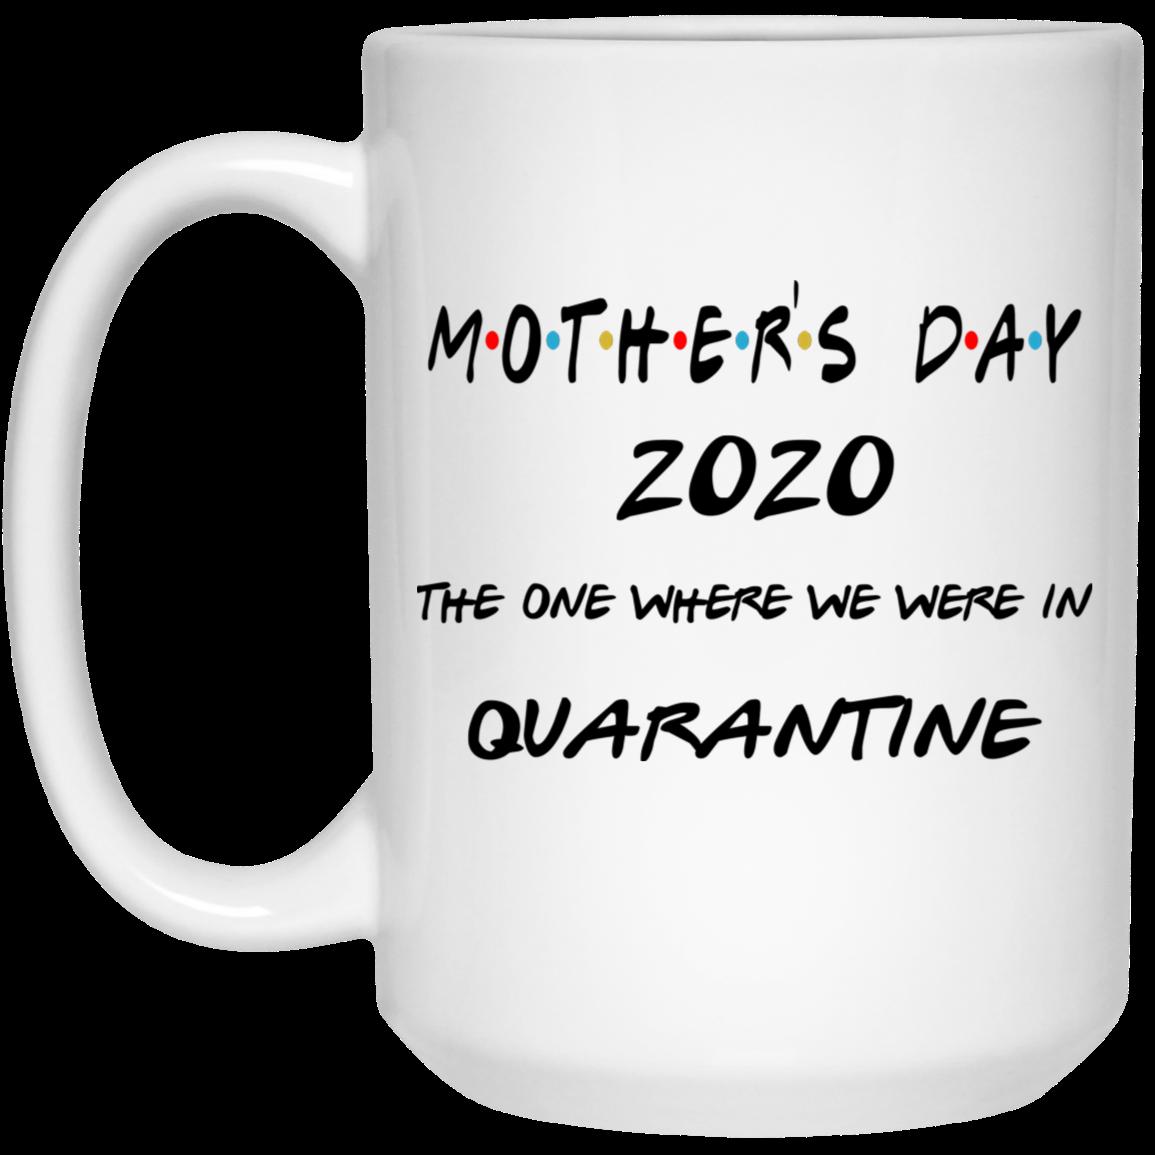 Mothers Day Gift The One Where We Were In Quarantine Coffee Mug 11oz White